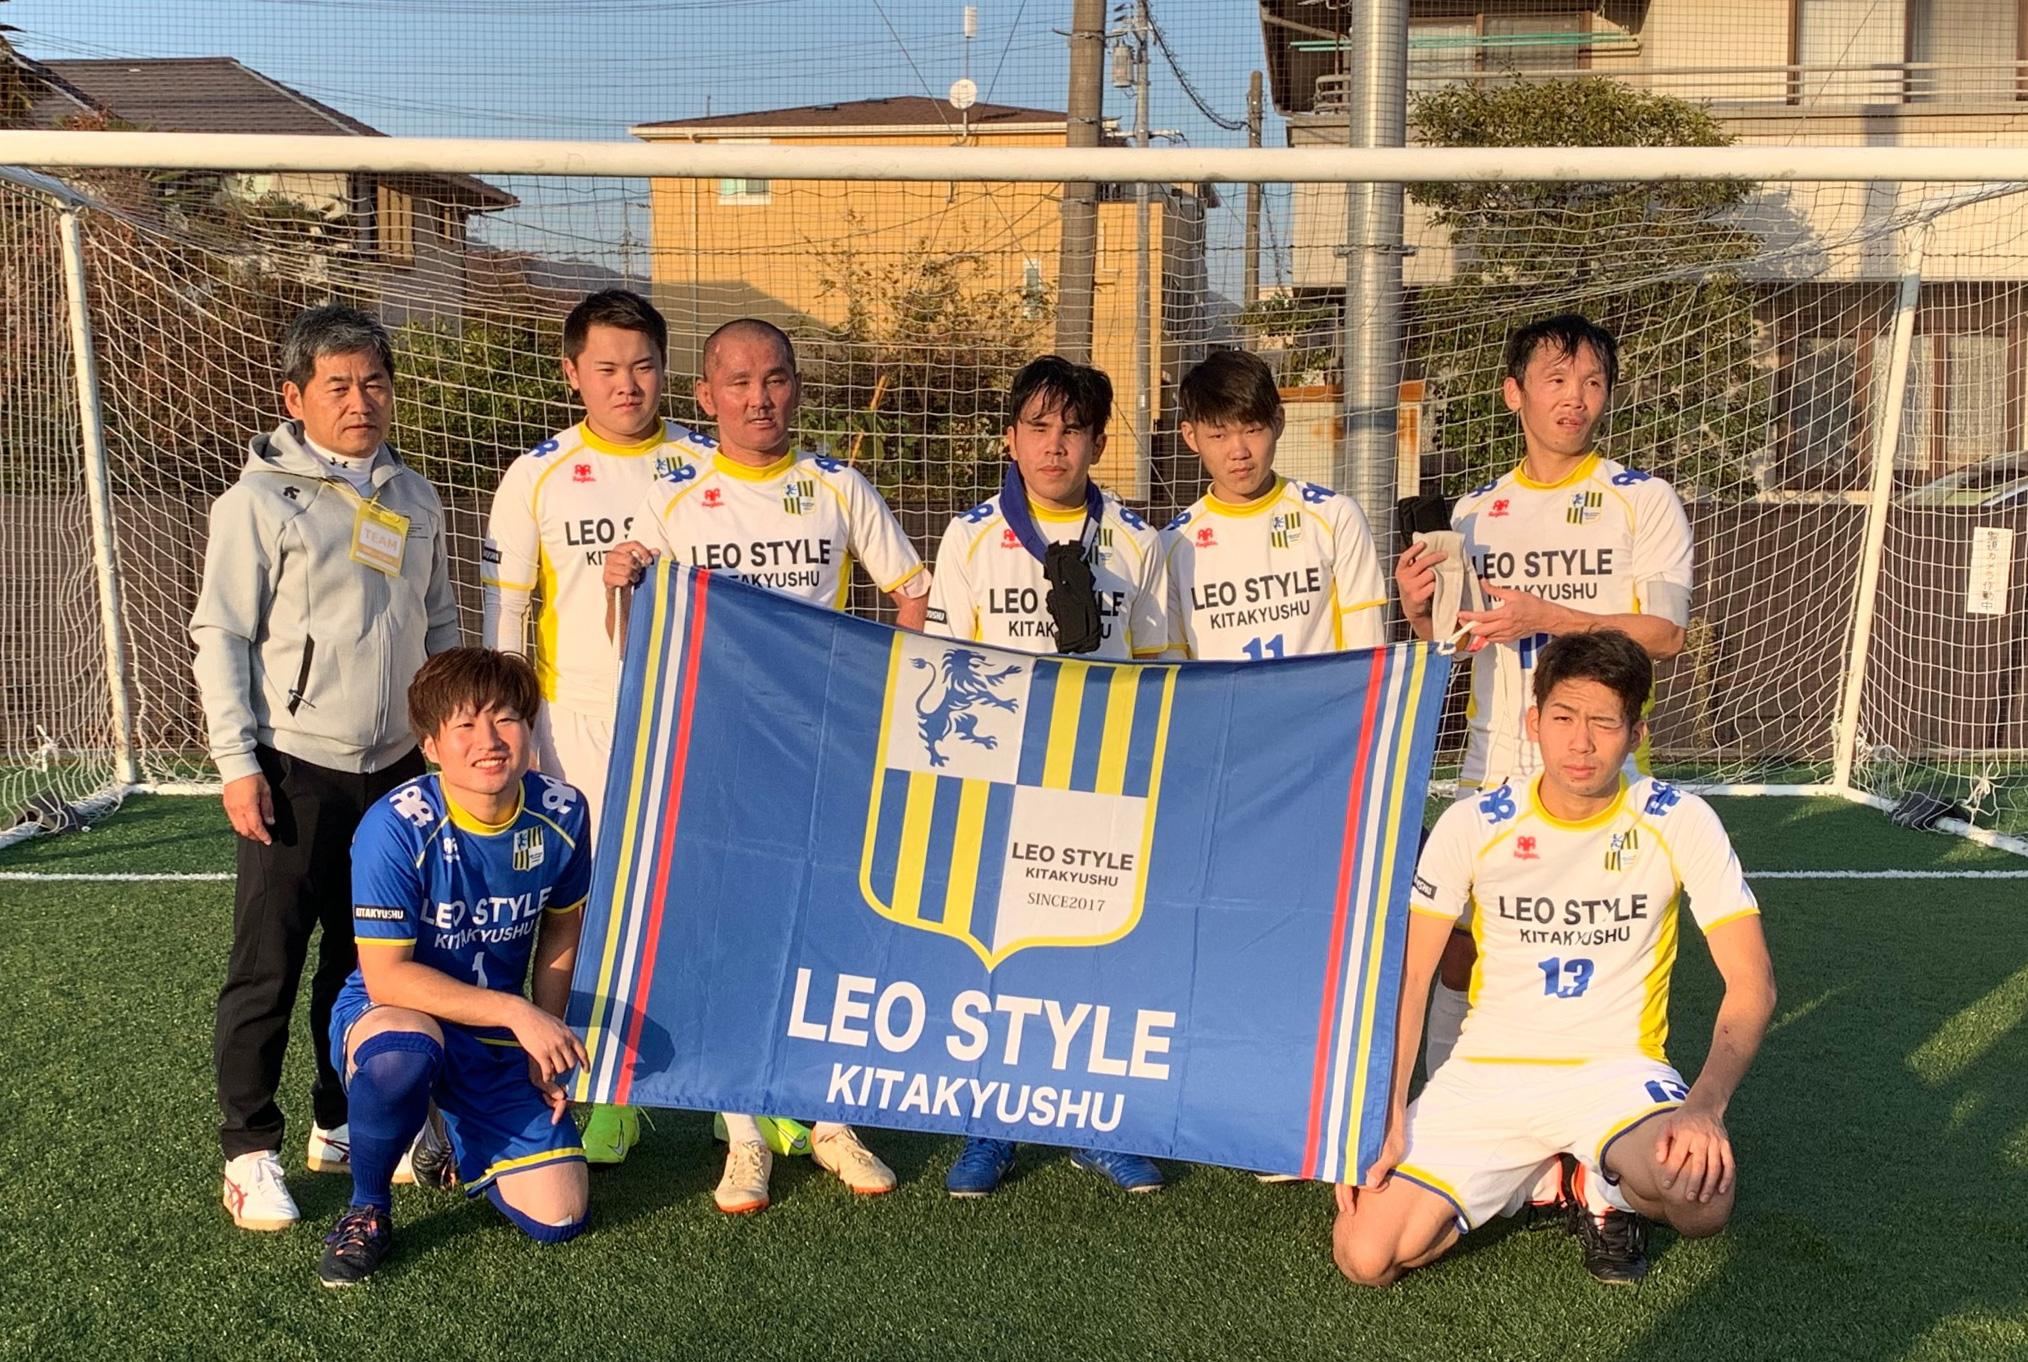 LEO STYLE 北九州の集合写真